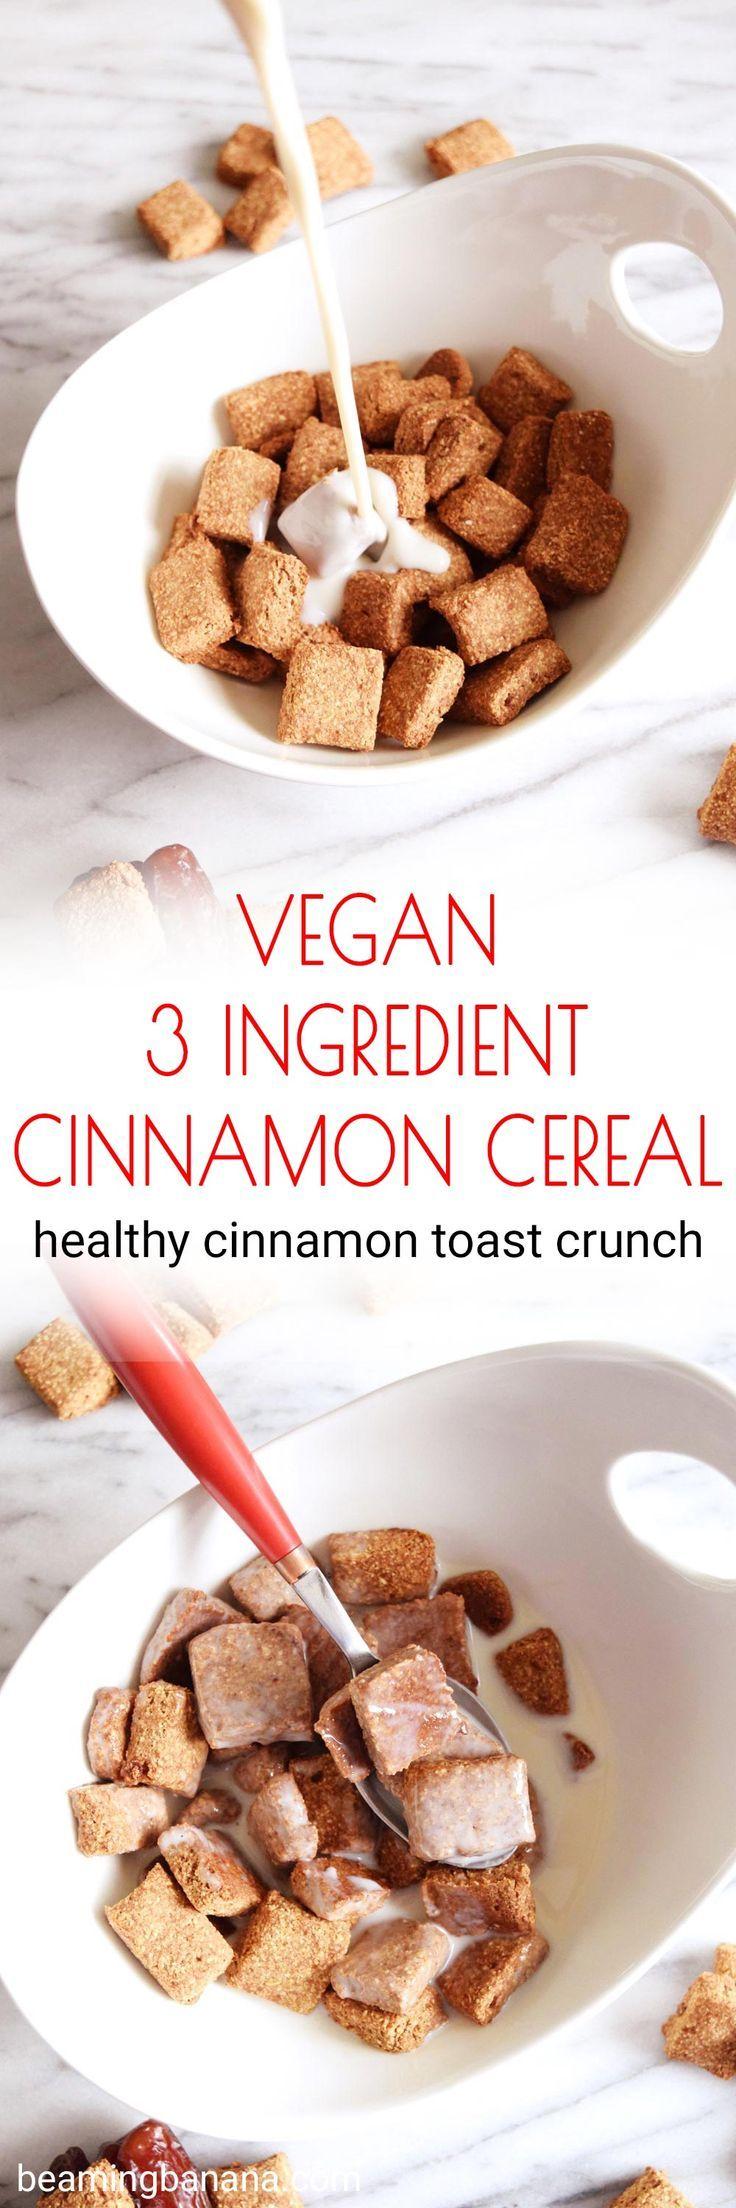 Vegan 3 Ingredient Cinnamon Cereal #cinnamontoastcrunch